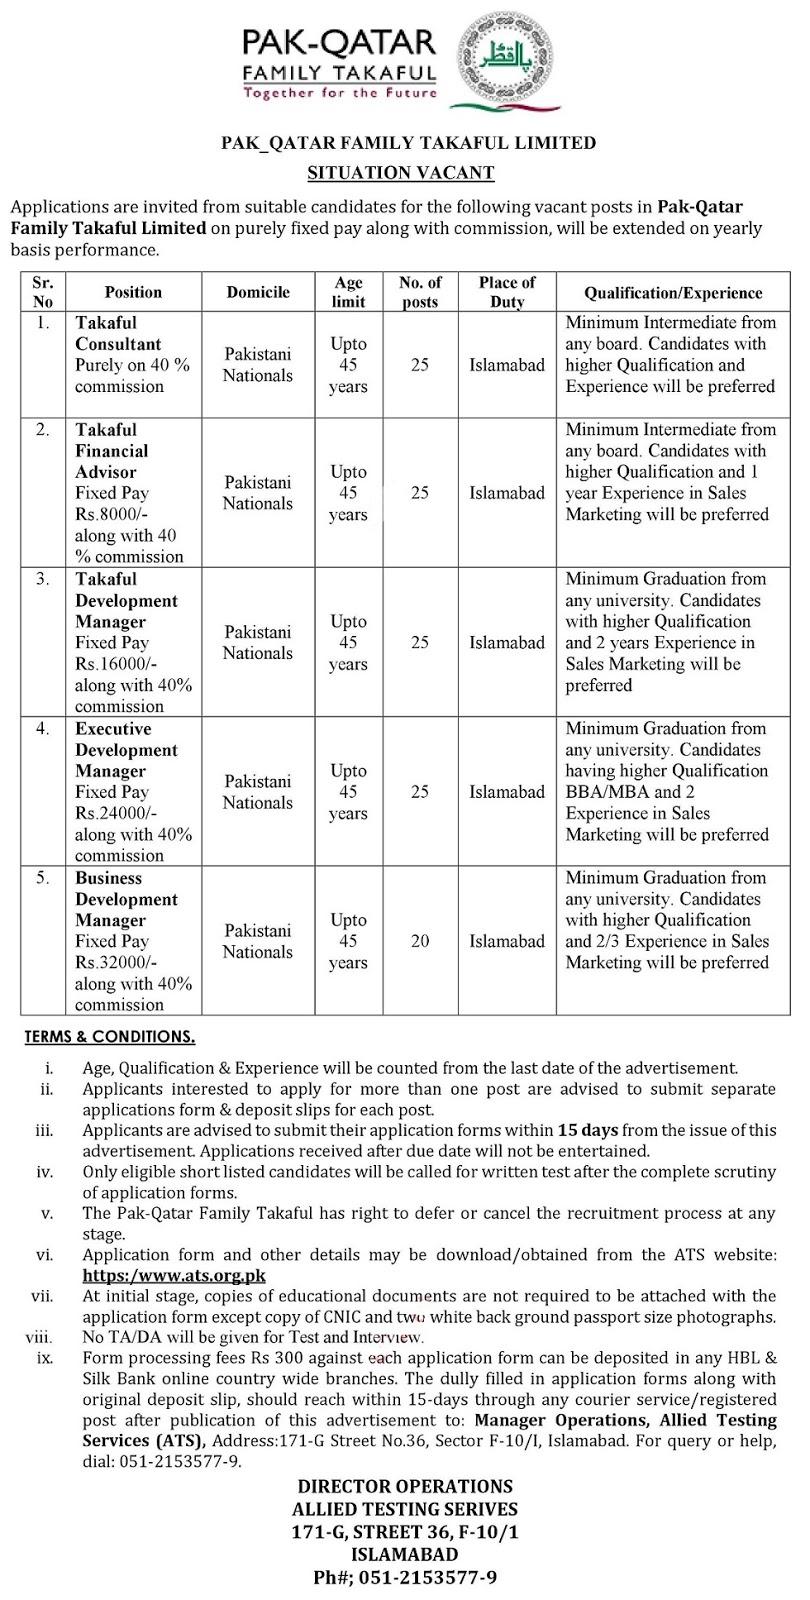 Pak Qatar Family Takaful Limited Jobs in Islamabad via ATS Testing Service 2020